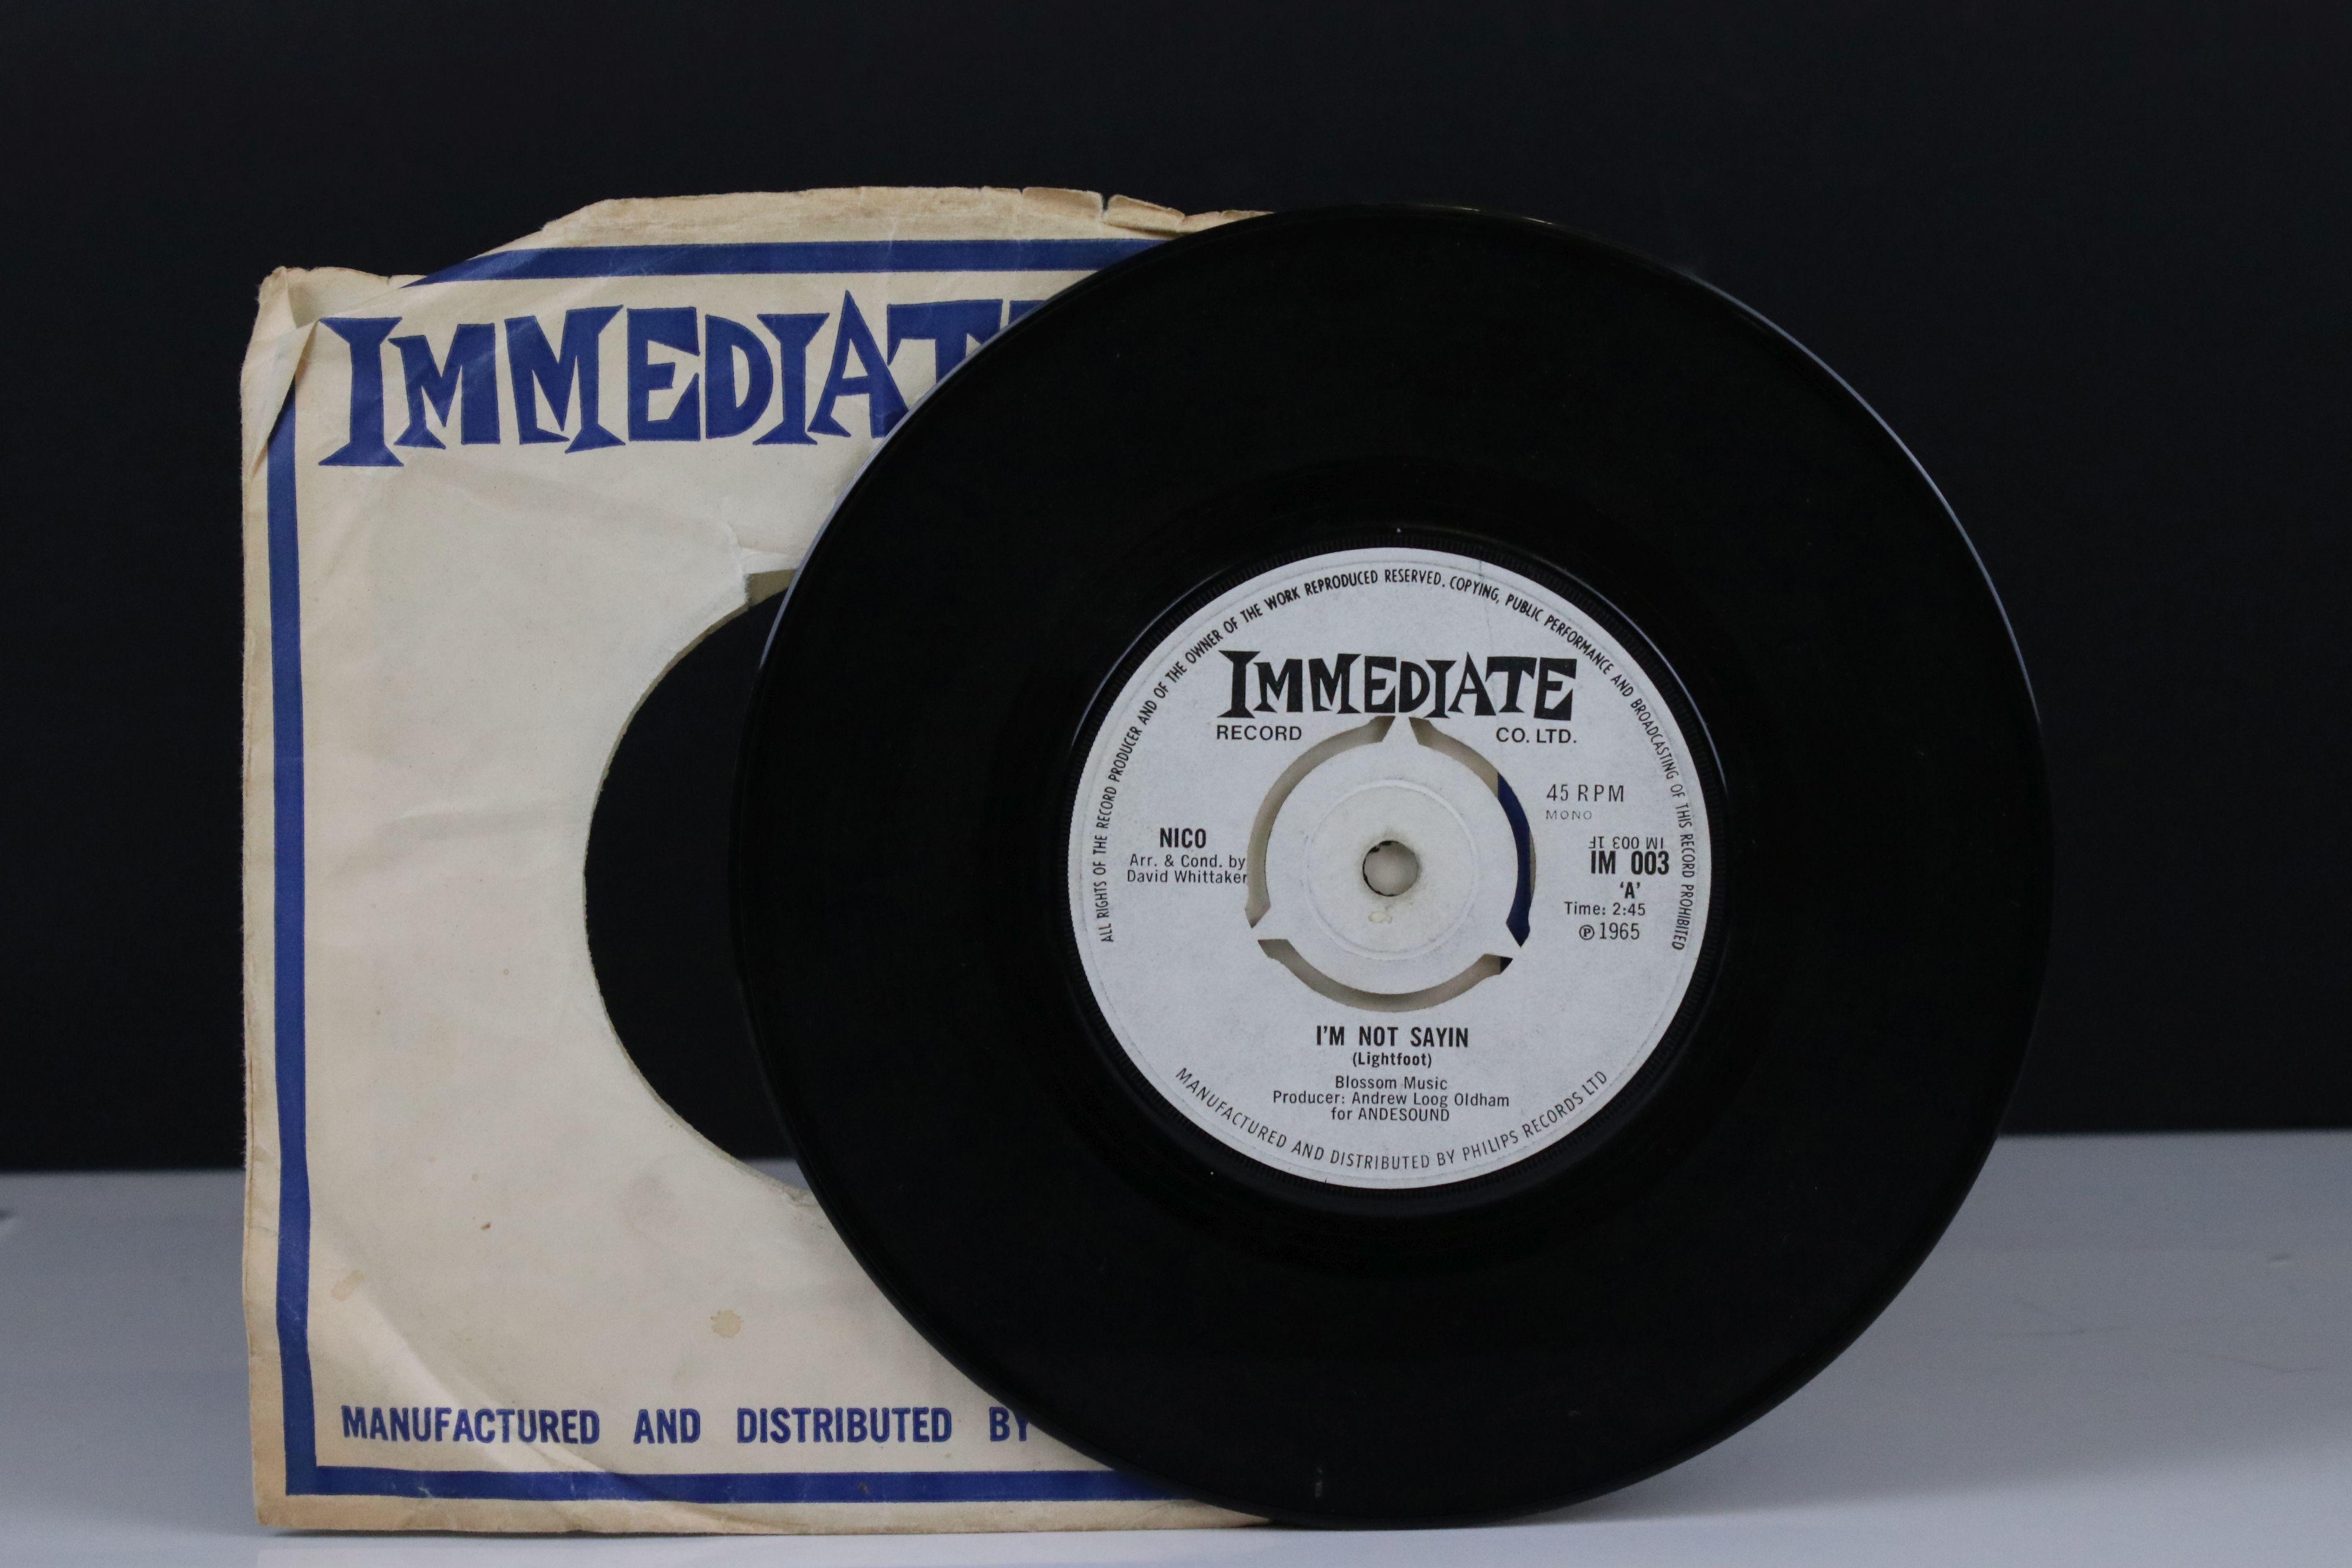 Vinyl - Nico I'm Not Sayin / The Last Mile 45 on Immediate IM003 in company sleeve, vg